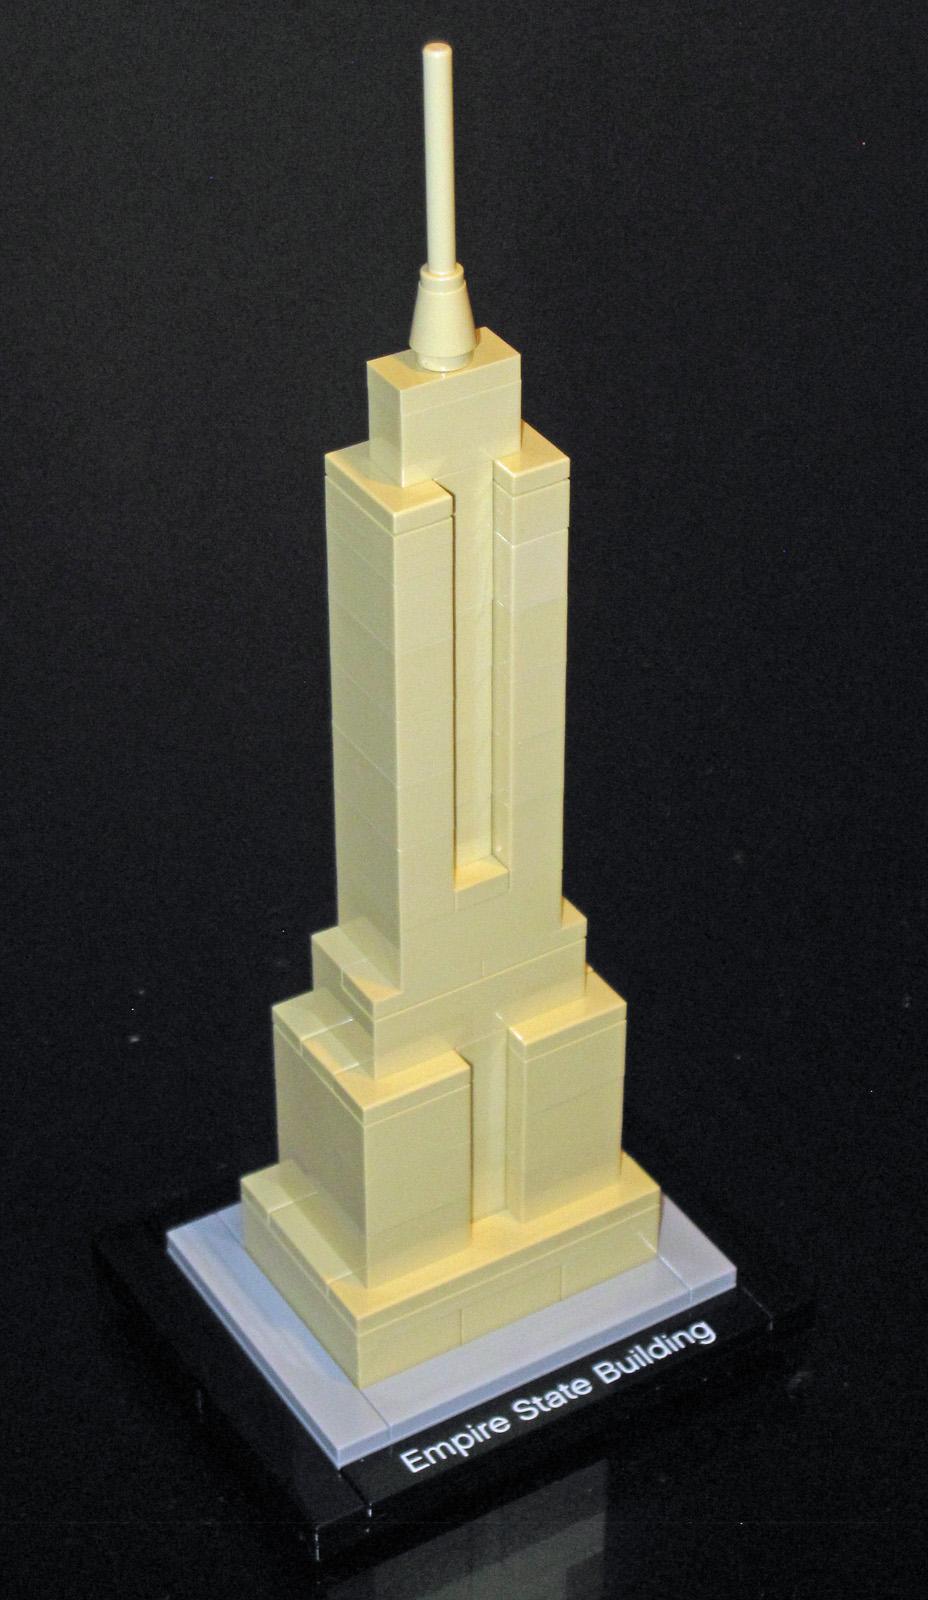 Lego_Architecture_21002_-_Empire_State_Building_(6981132780)